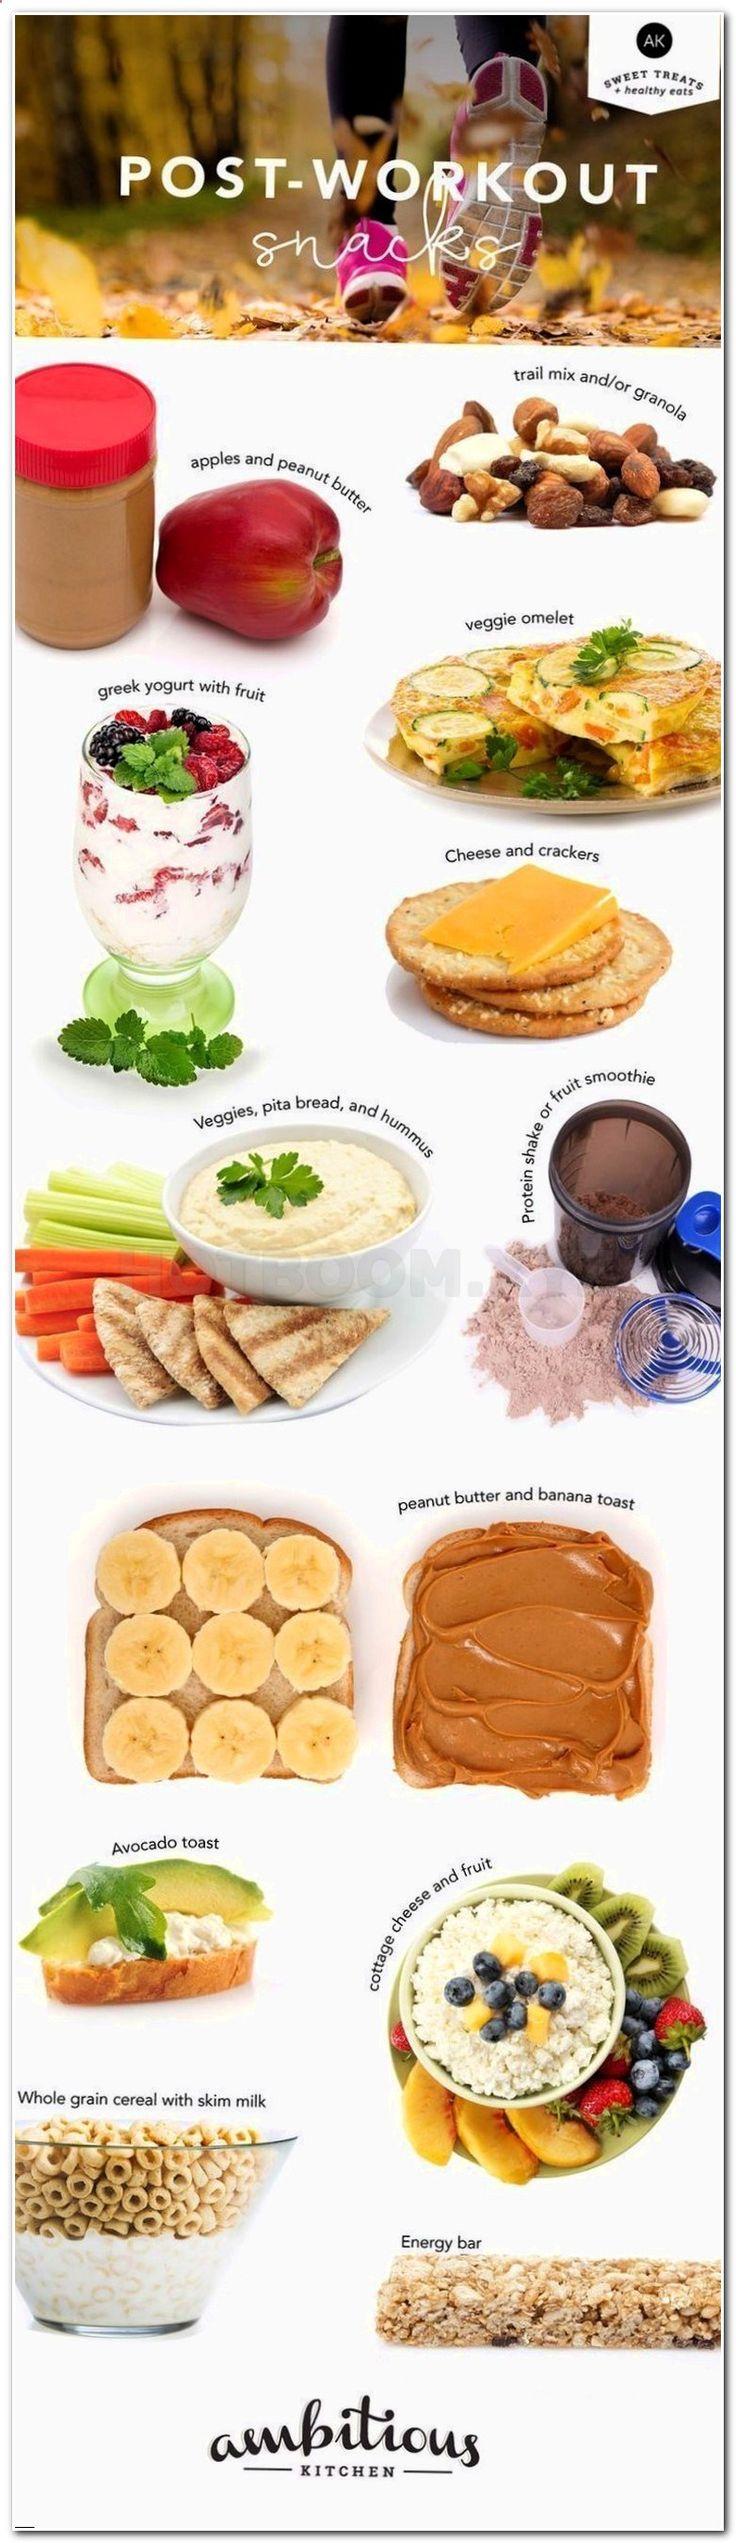 High Calorie Vegan Foods For Shake